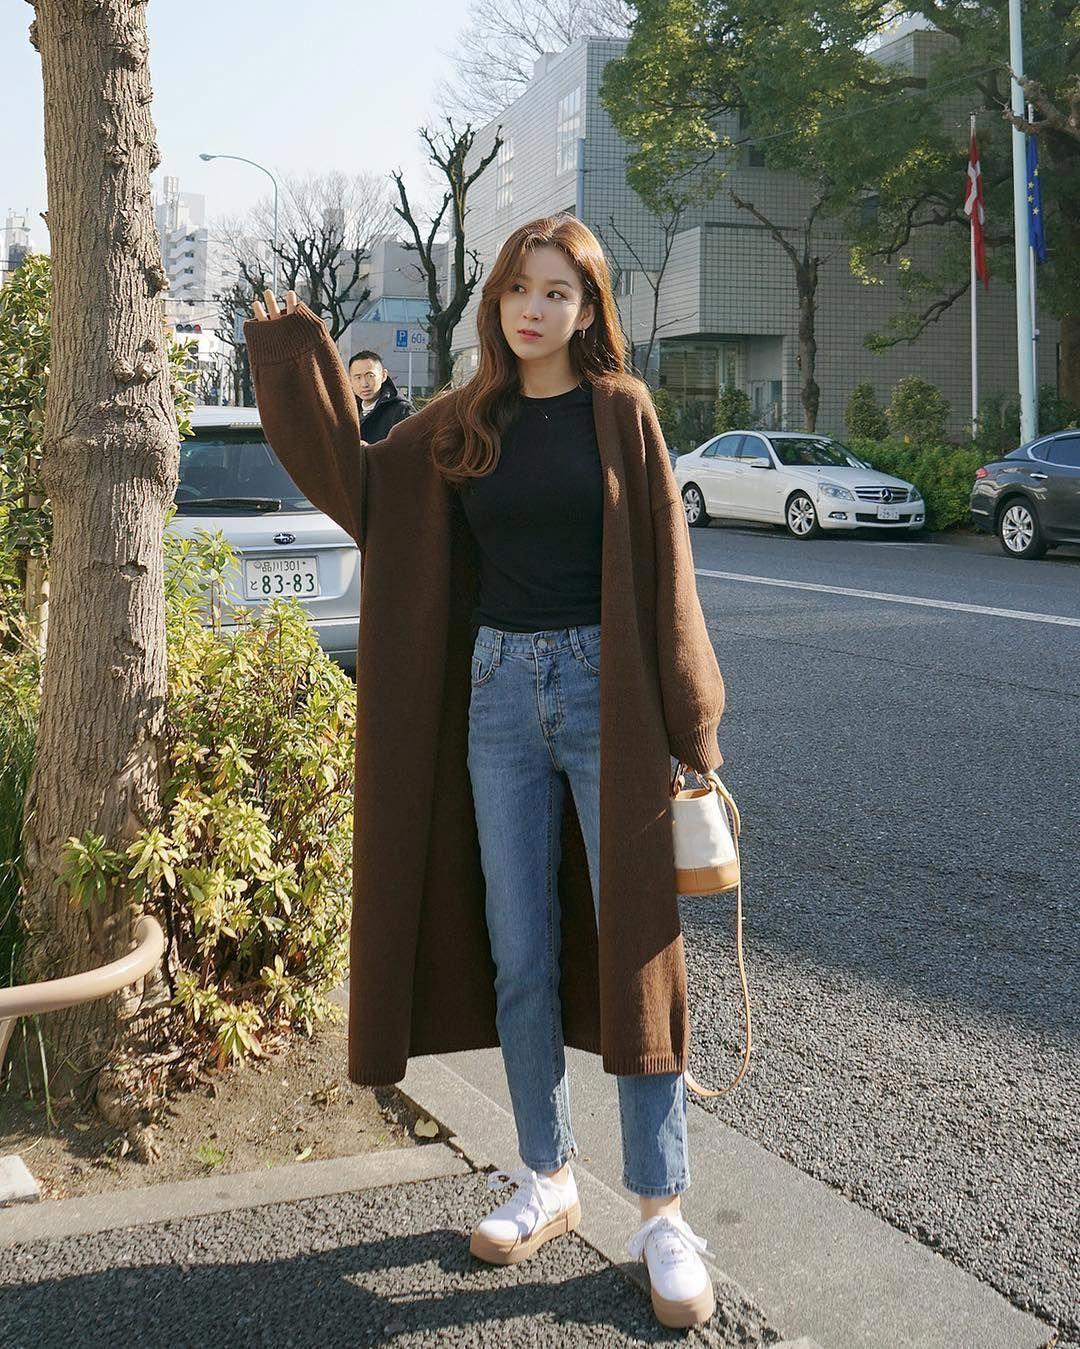 pighip(MT) banyoonhee style 2017 koreanstylefashion Korea Spring Fashion,  Japan